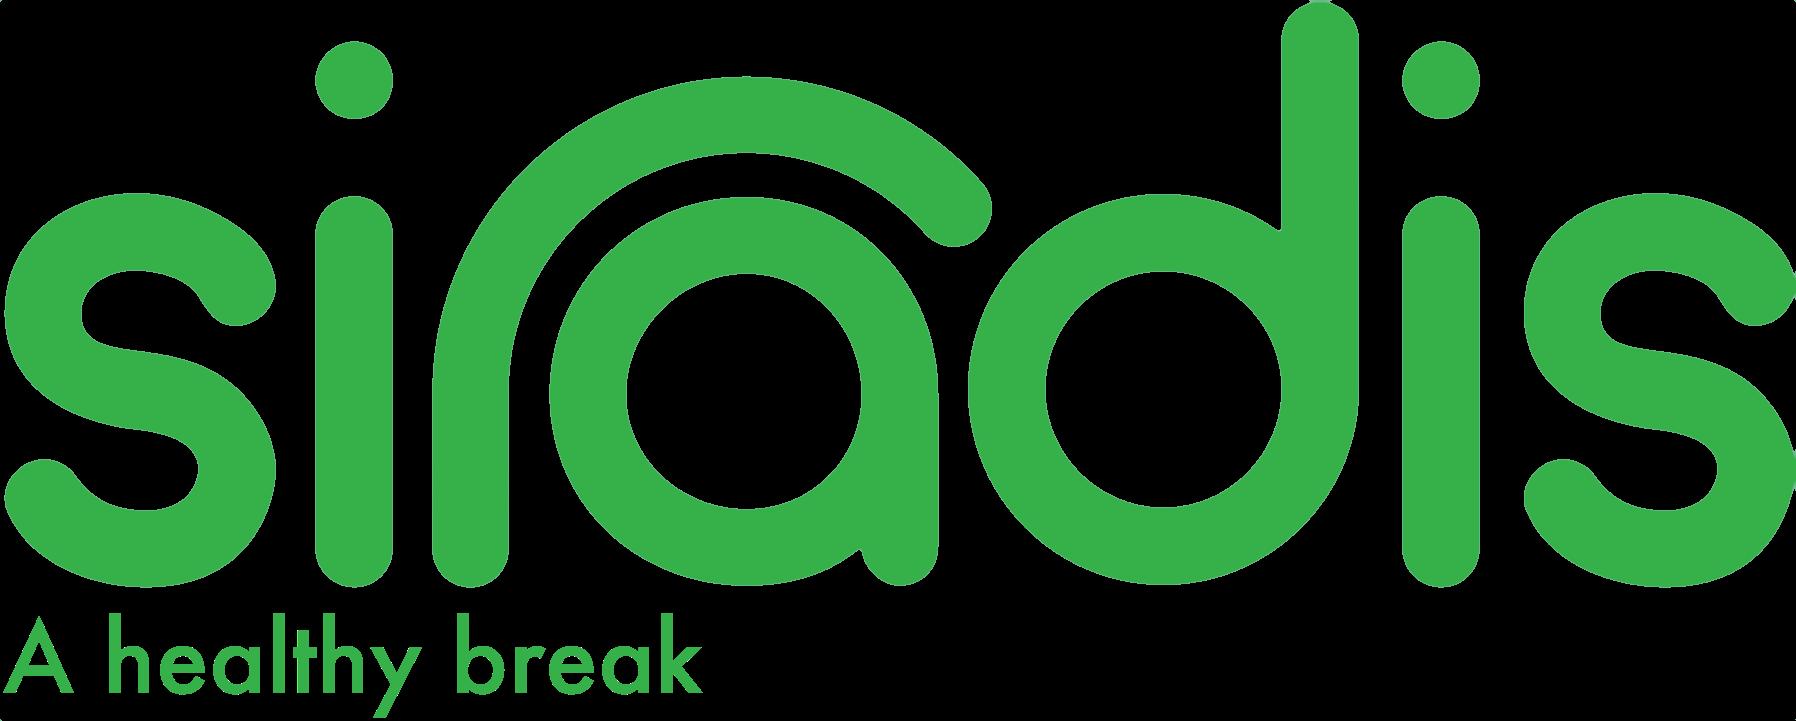 Siradis logo.png